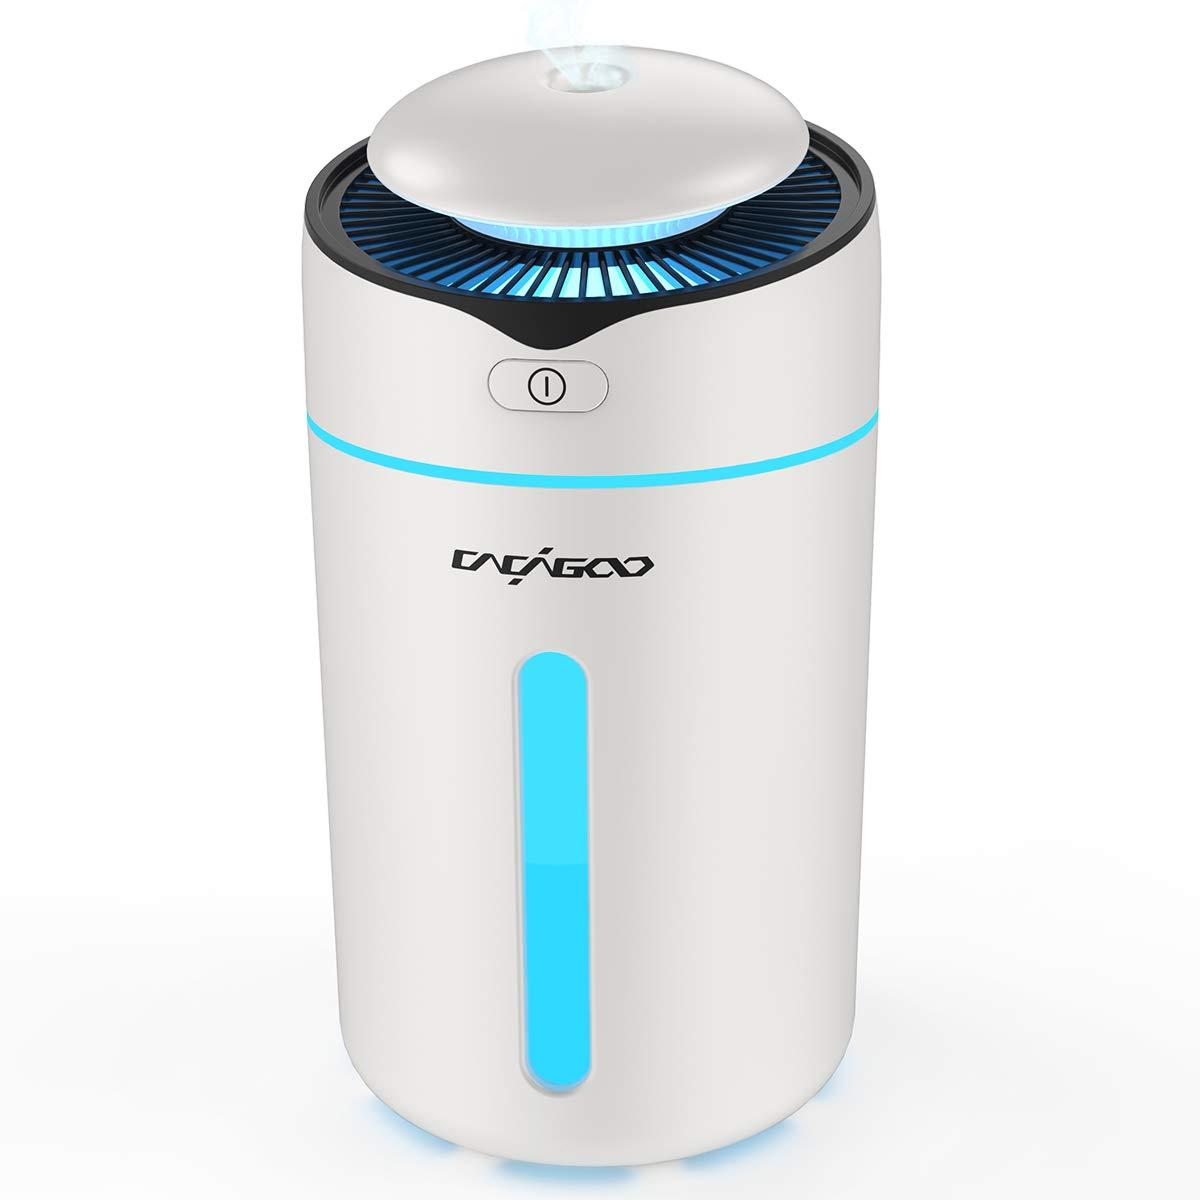 CACAGOO 300ml Mini Humidificador Bebes (Niebla de 2 Niveles, LED 7 Luces de Colores, Apagado Automático y fuente de Alimentación USB) Humidificador Ultrasónico Silencioso,Blanco